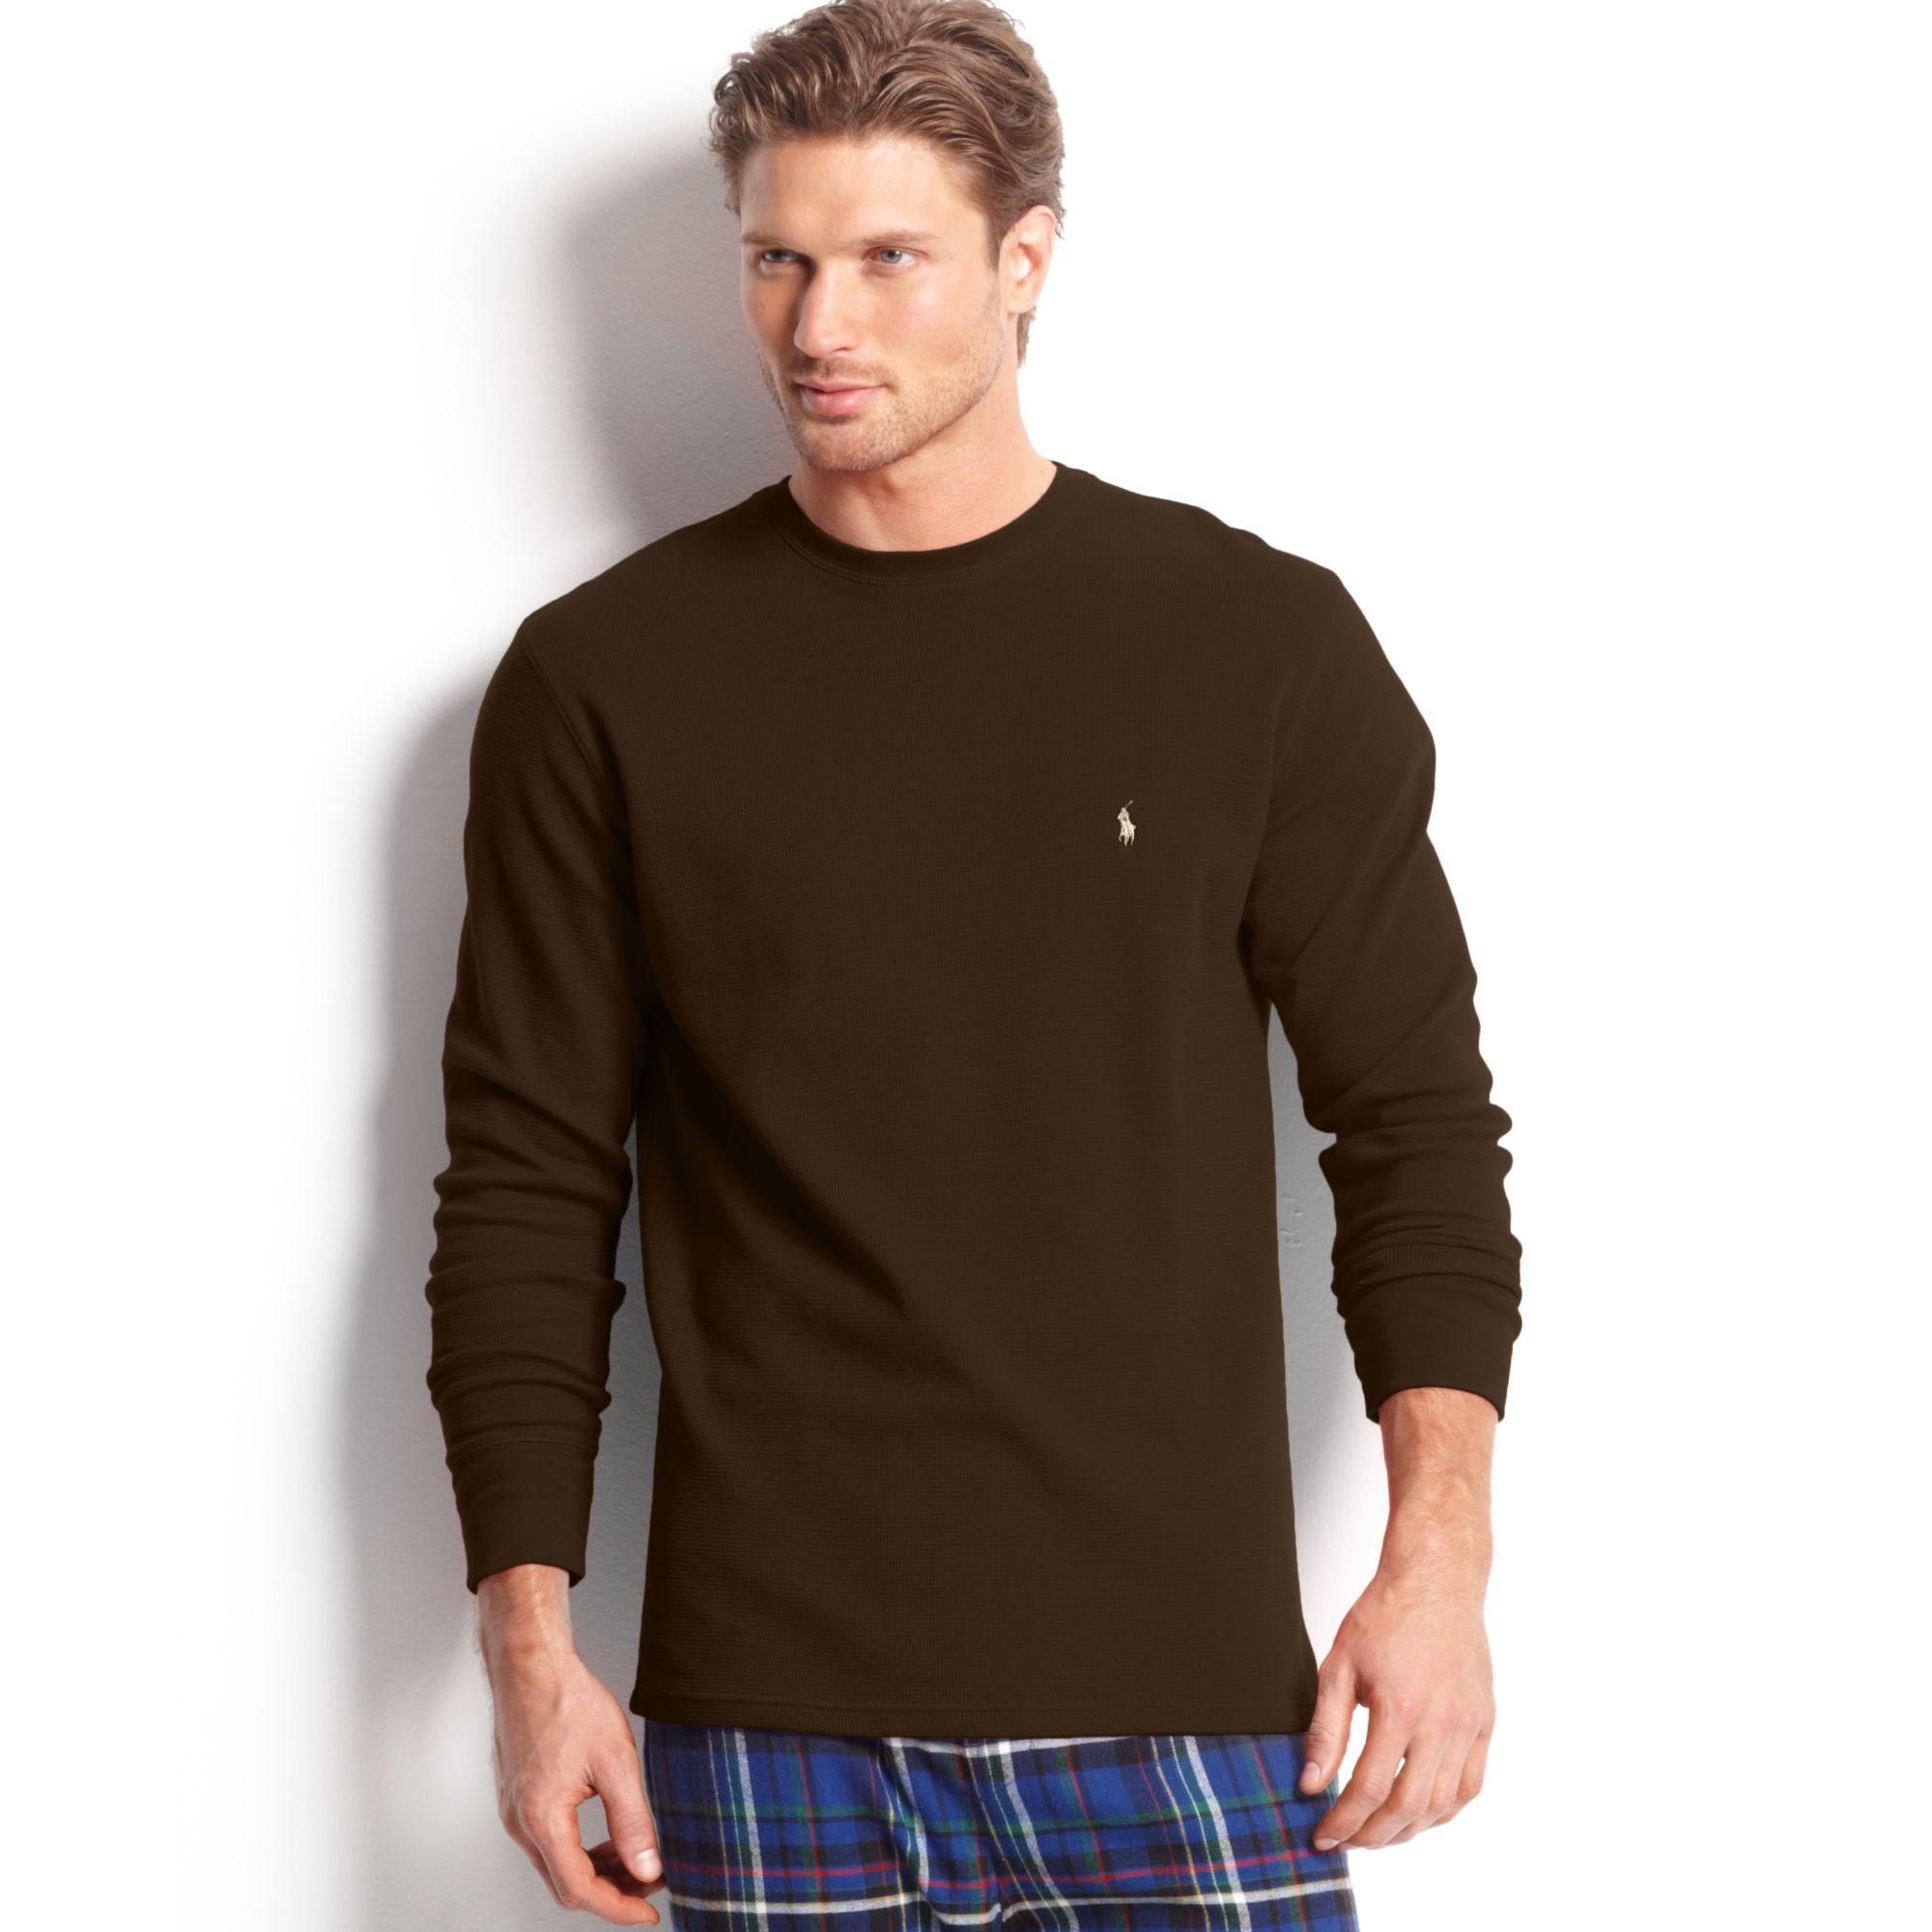 c9fc5f6c0af Lyst - Ralph Lauren Long Sleeve Crew Neck Waffleknit Thermal Tshirt ...